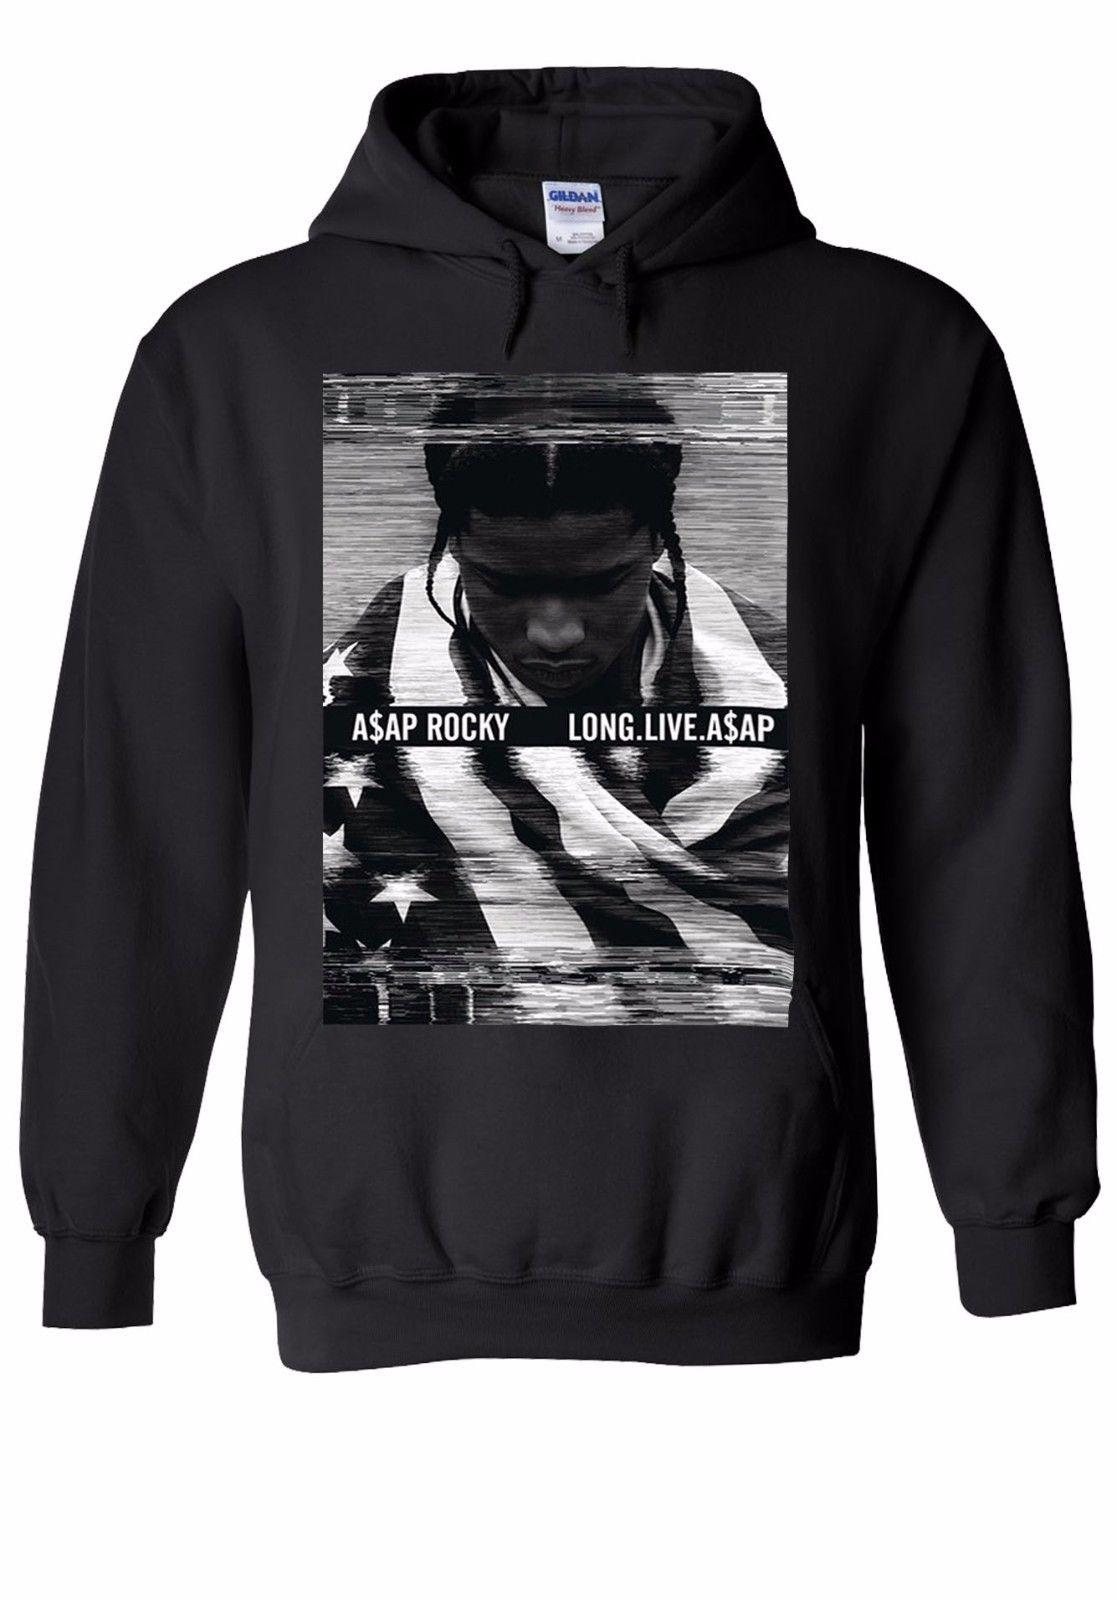 ASAP Rocky Long Live Funny Rap Men Women Unisex Top Hoodie Sweatshirt 2